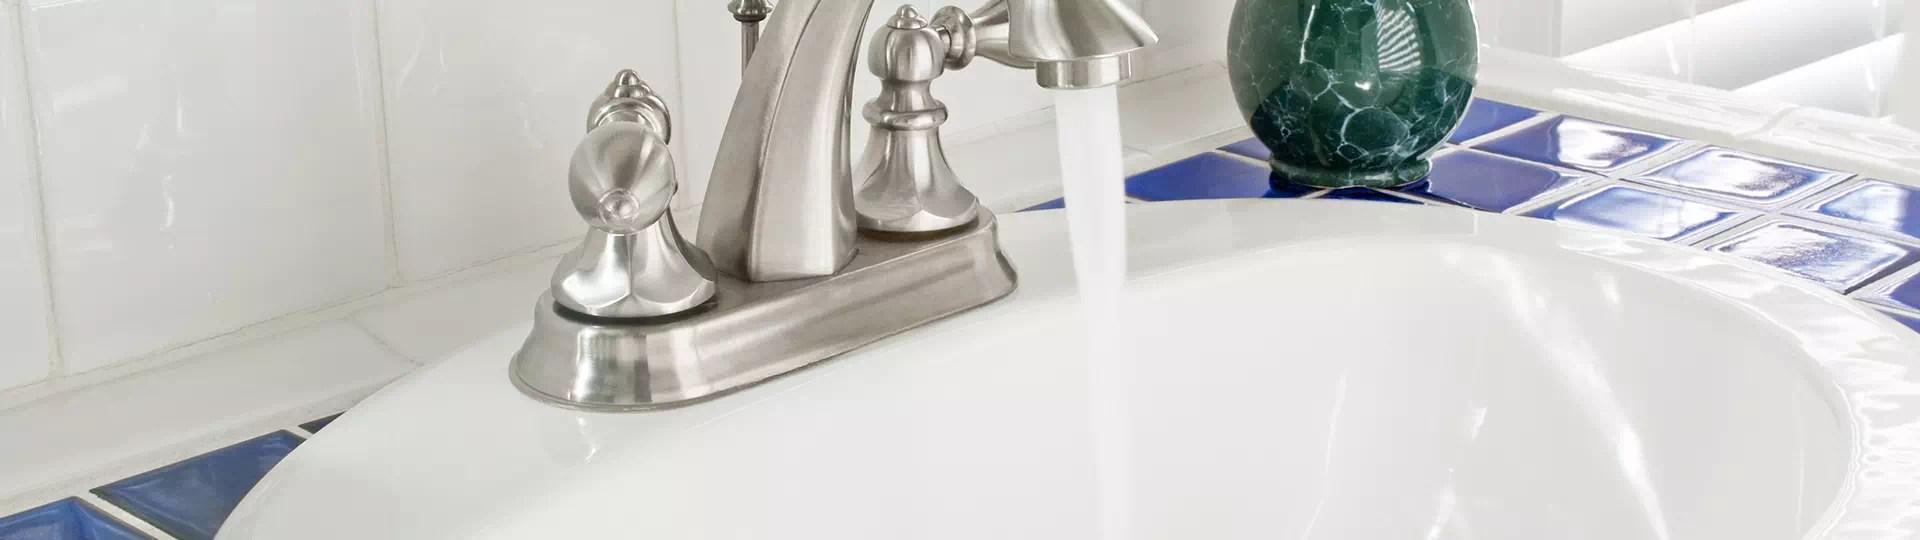 how to clean bathroom sink simple green